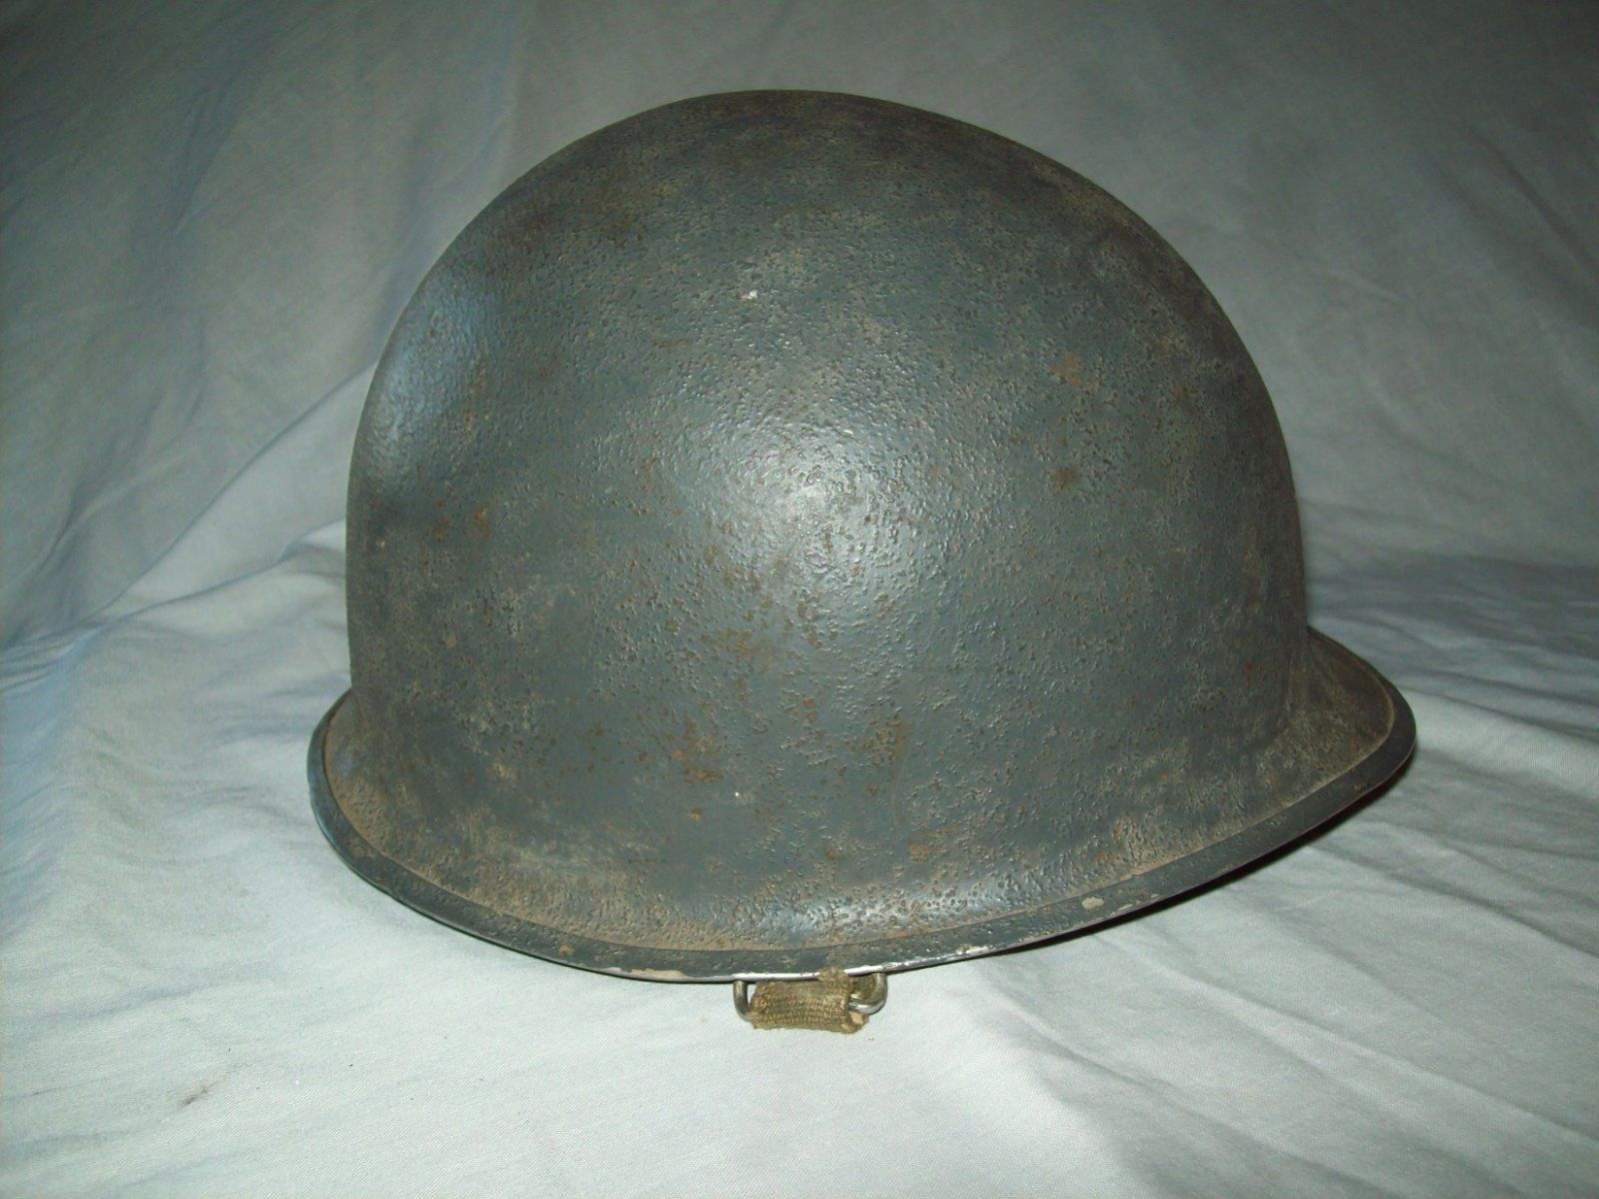 M1 helmet dating slovenia dating